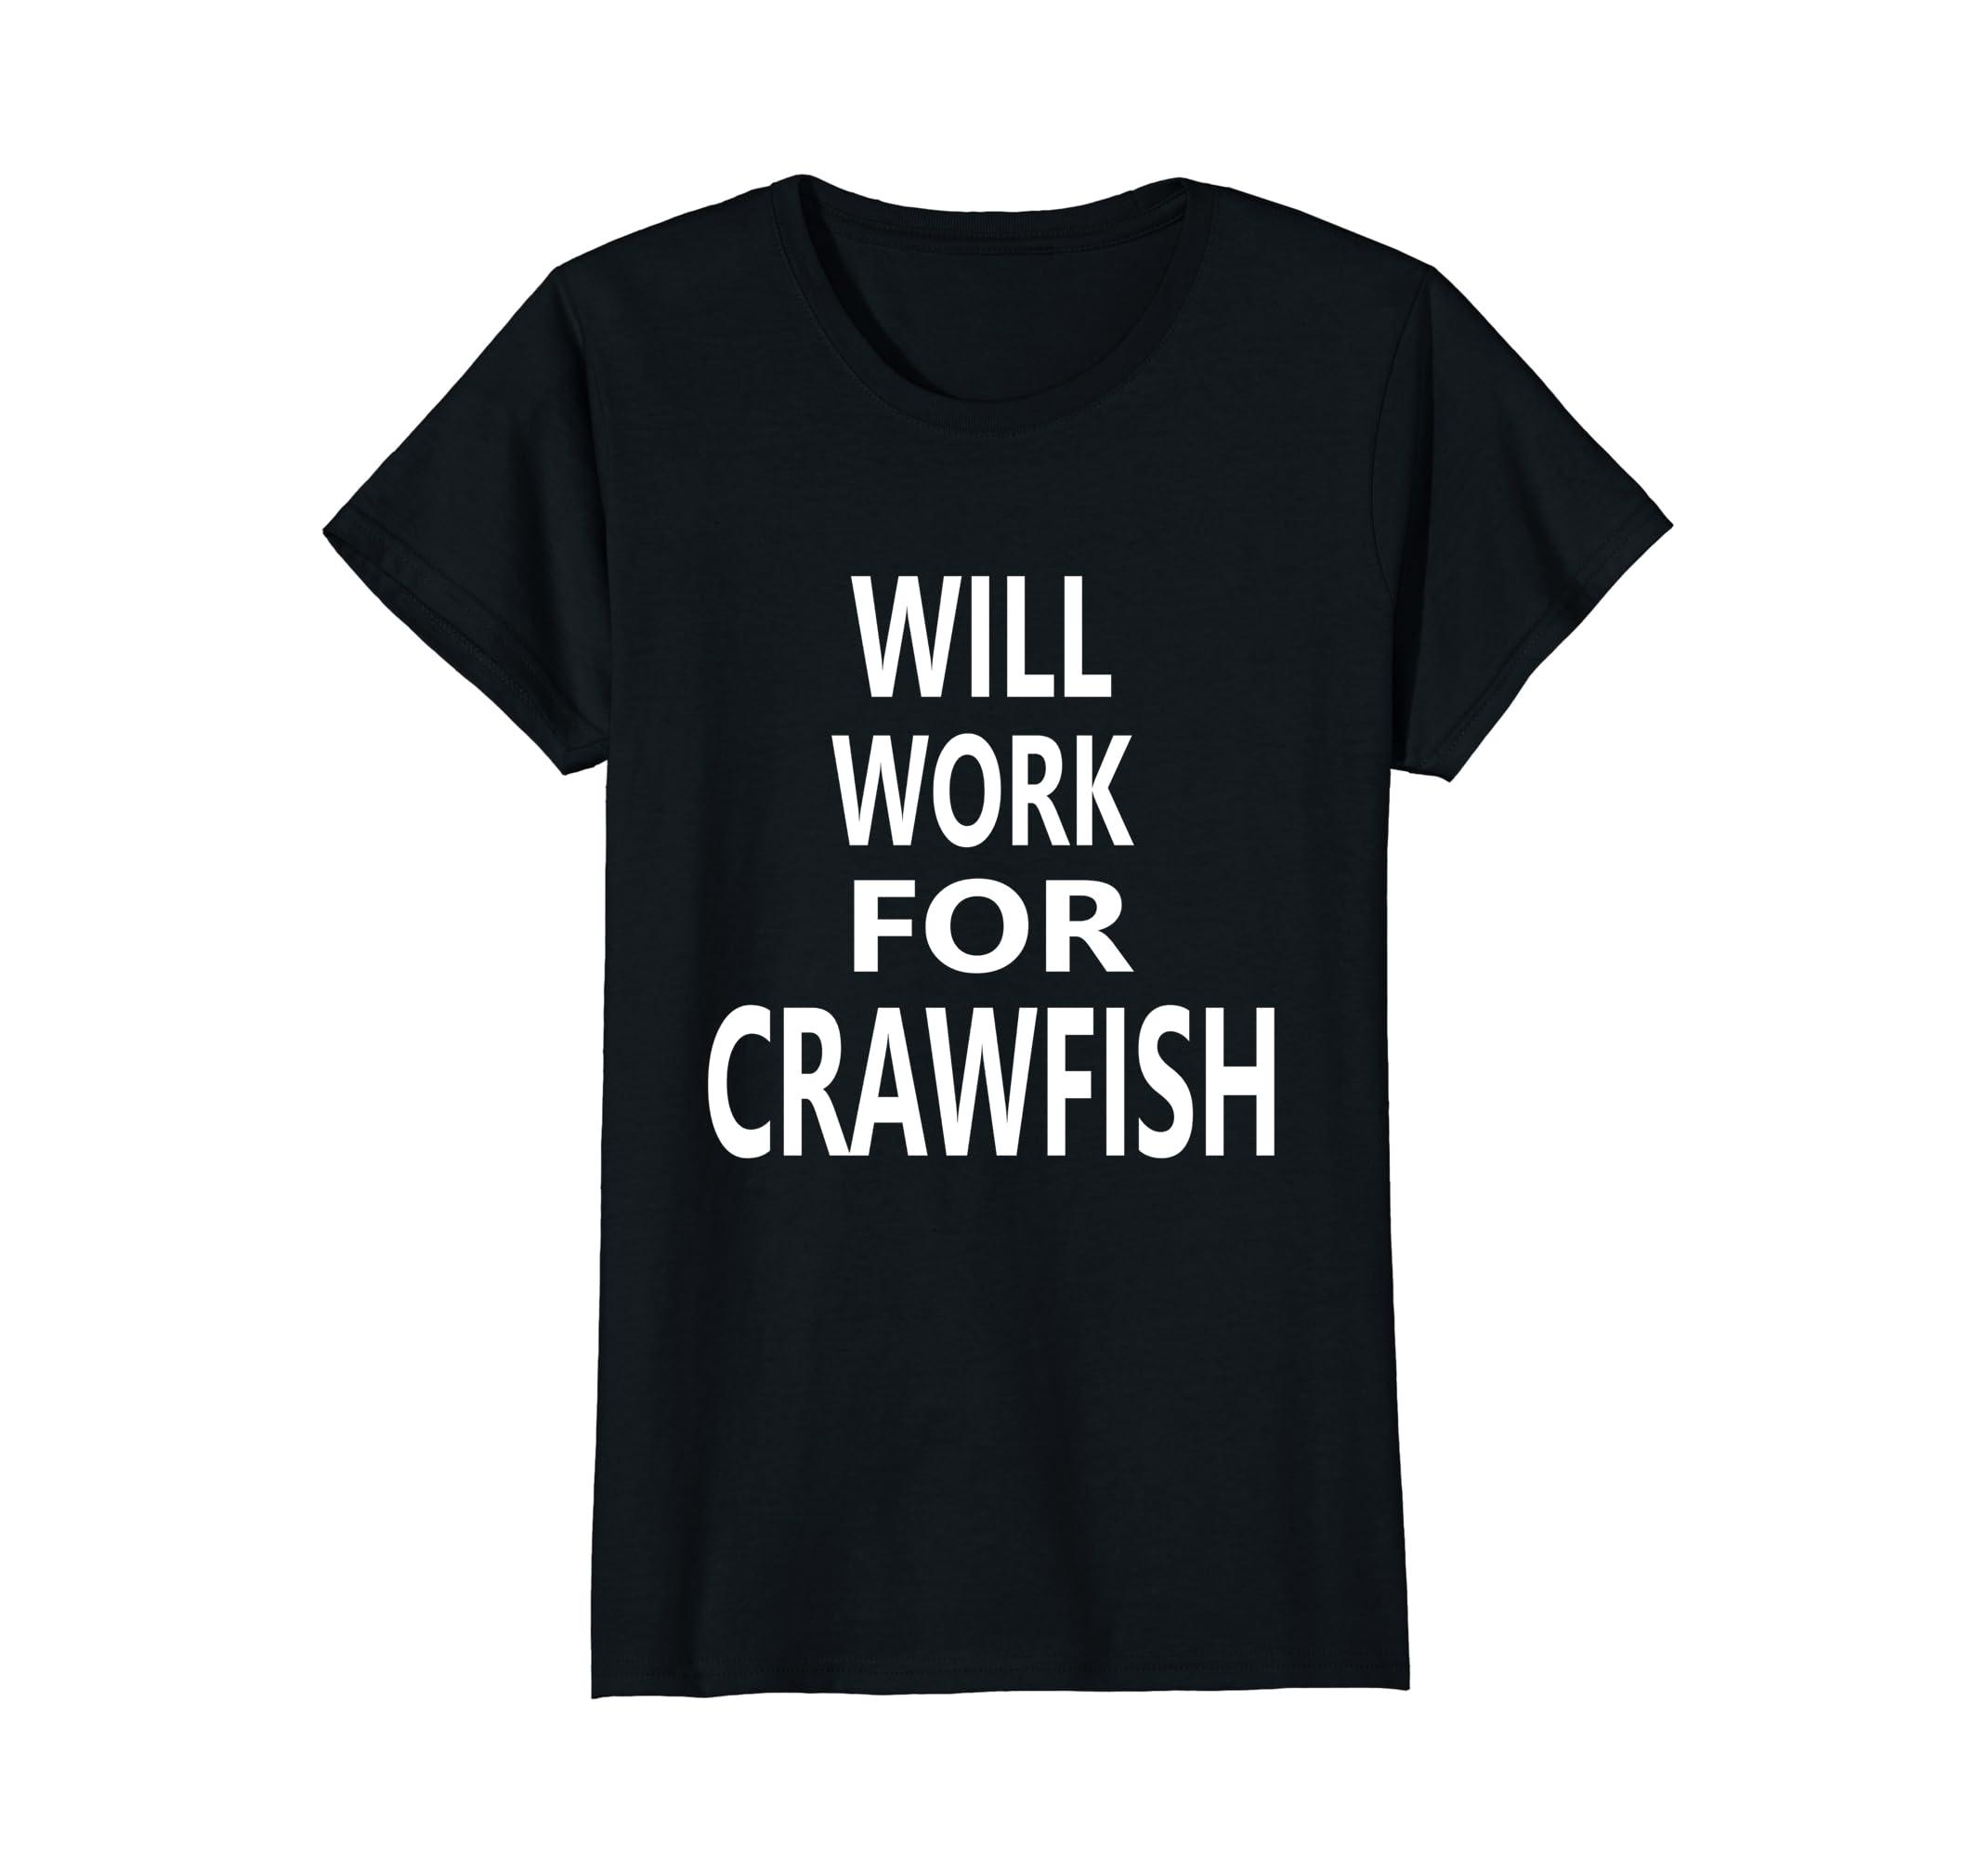 e75f144b Amazon.com: Will Work For Crawfish Funny Louisiana Cajun T-shirt: Clothing